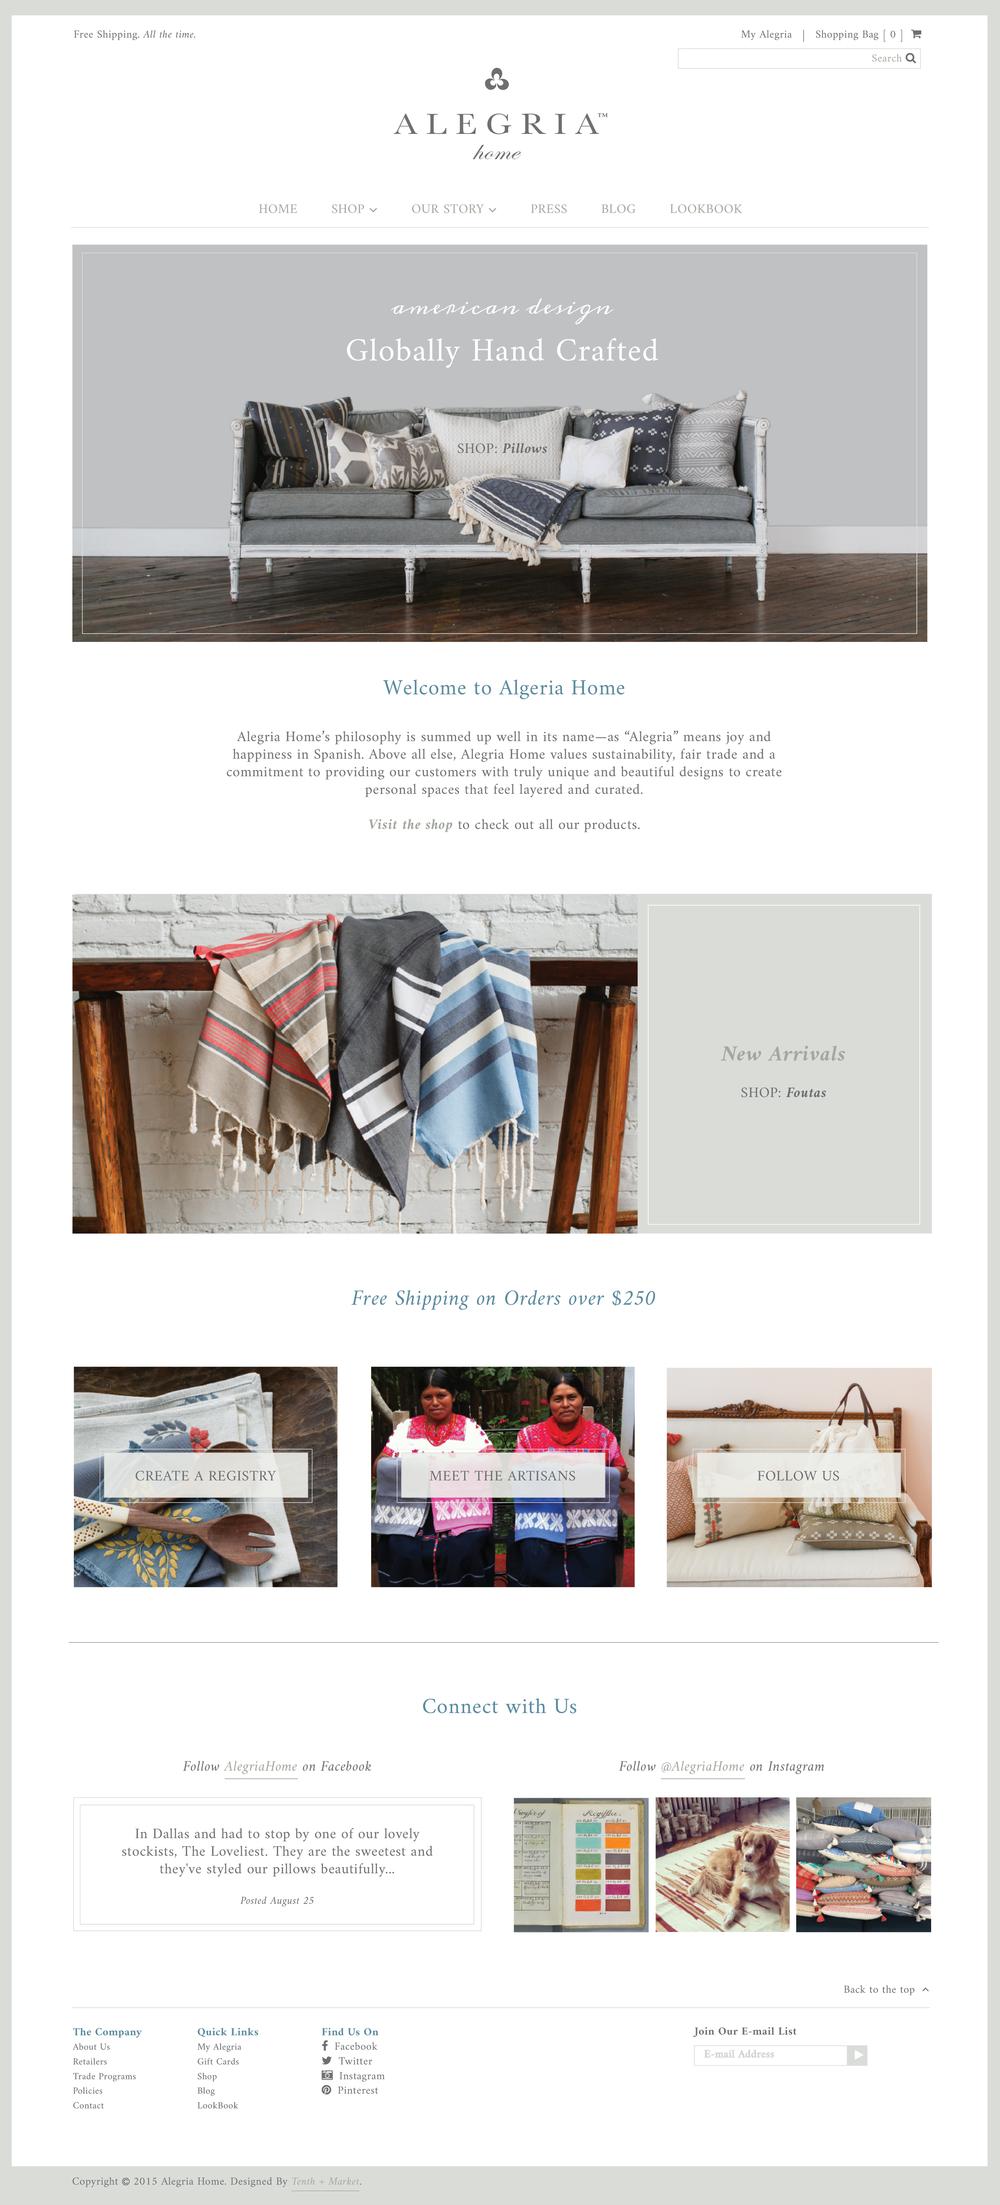 homepage_0-01.png